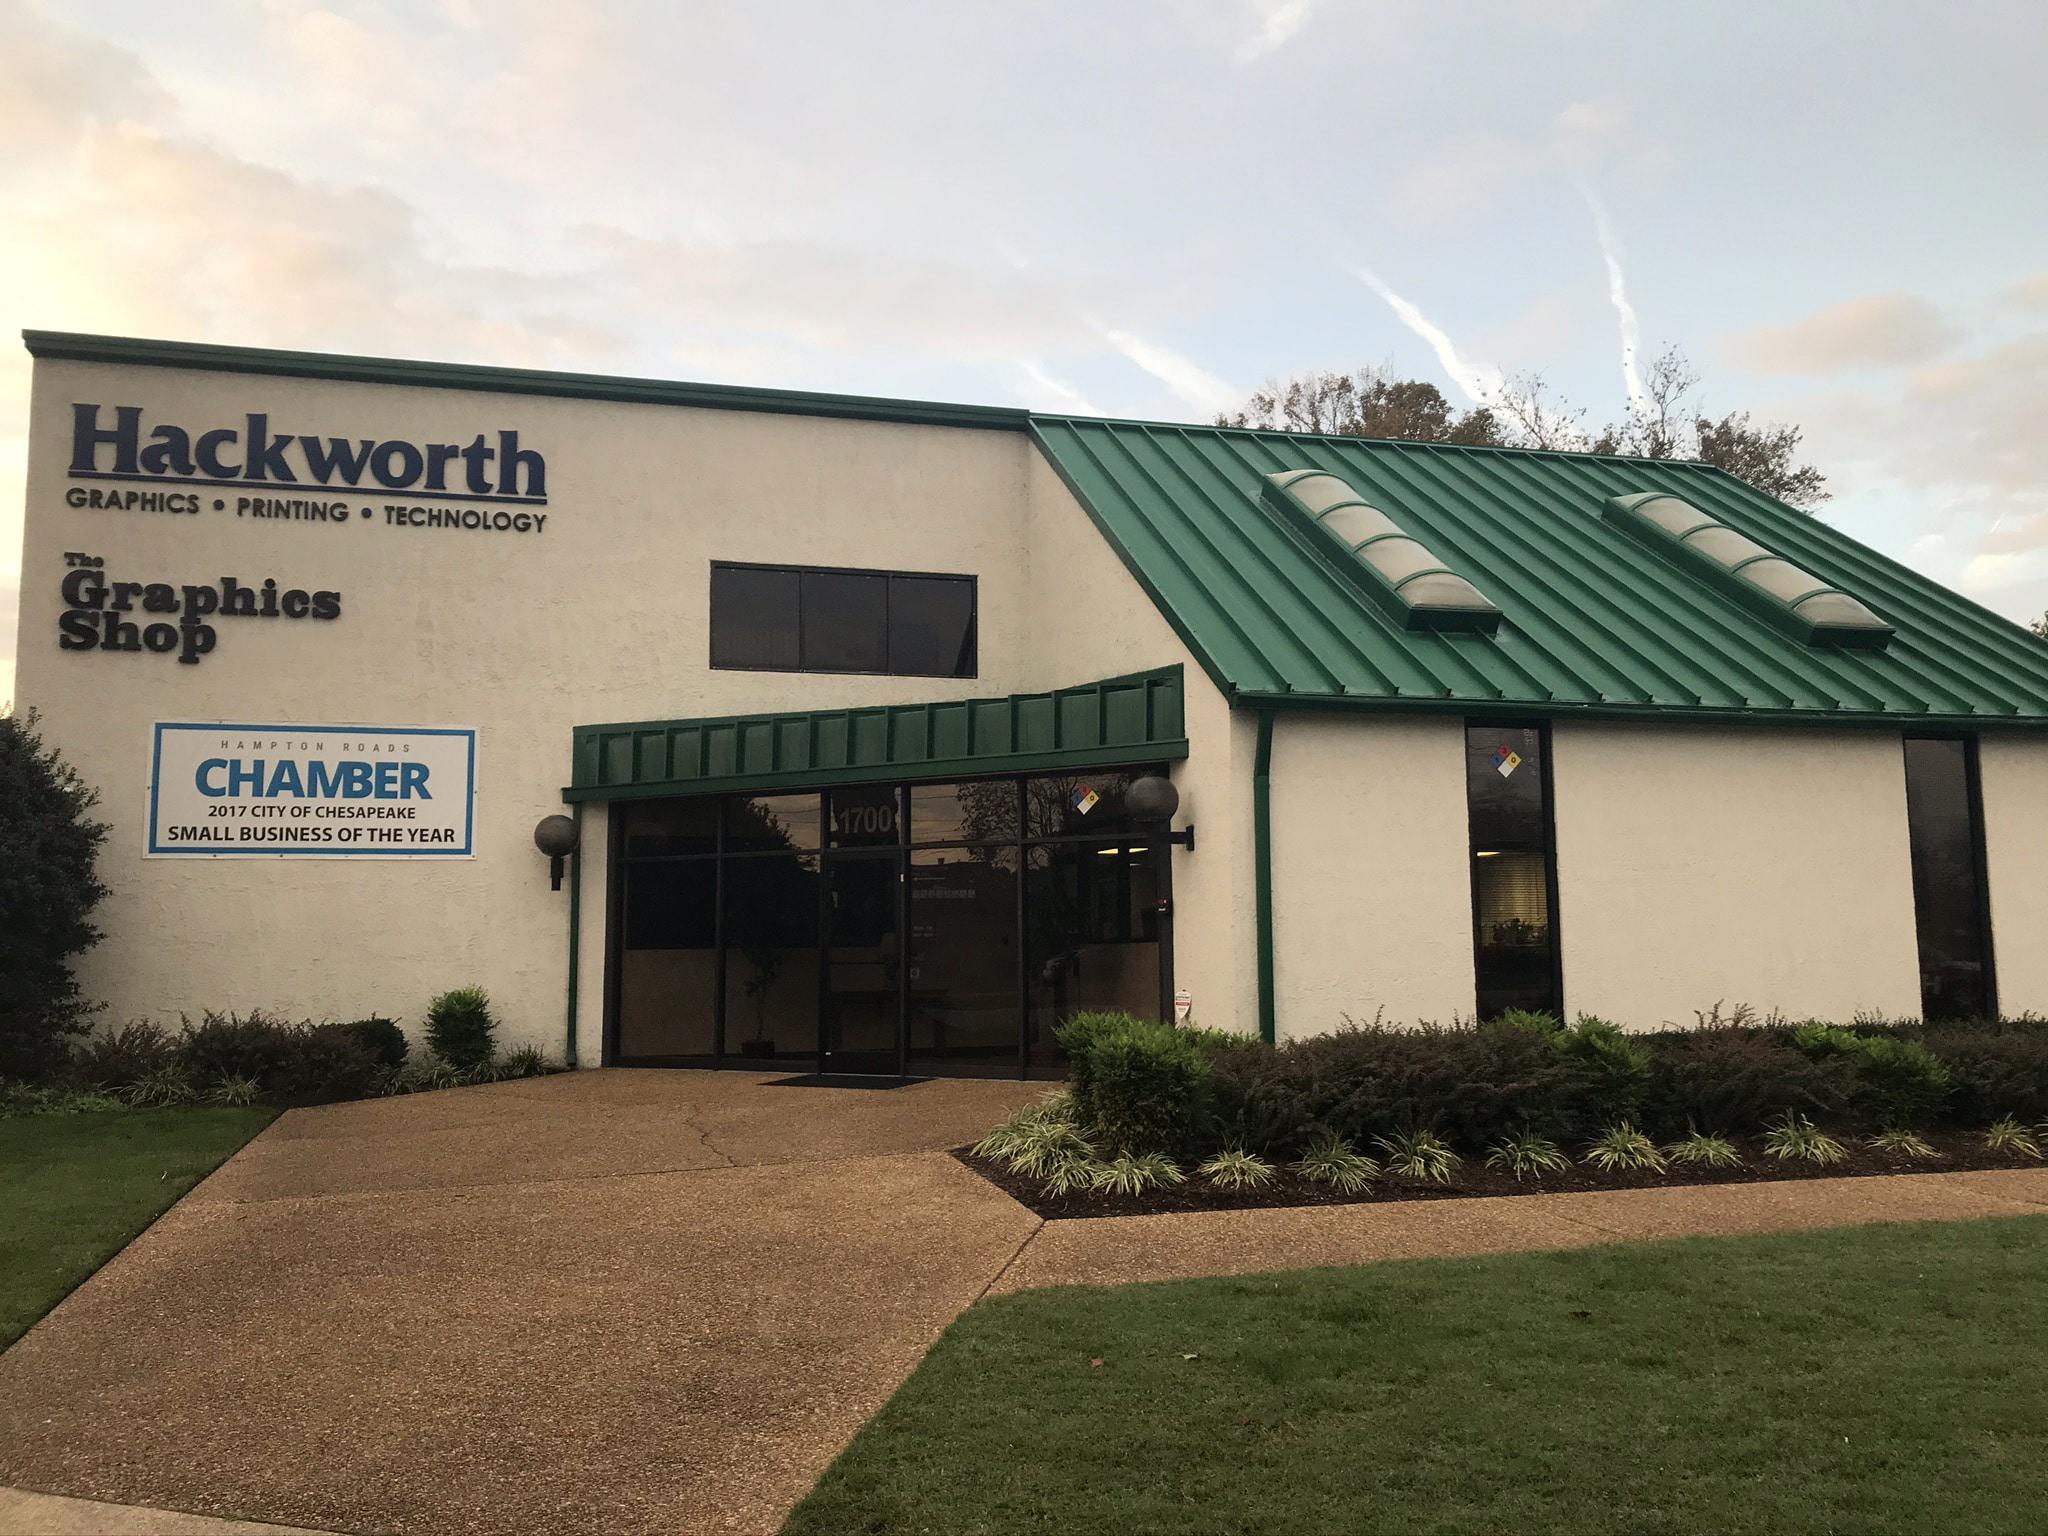 Hackworth Headquarters